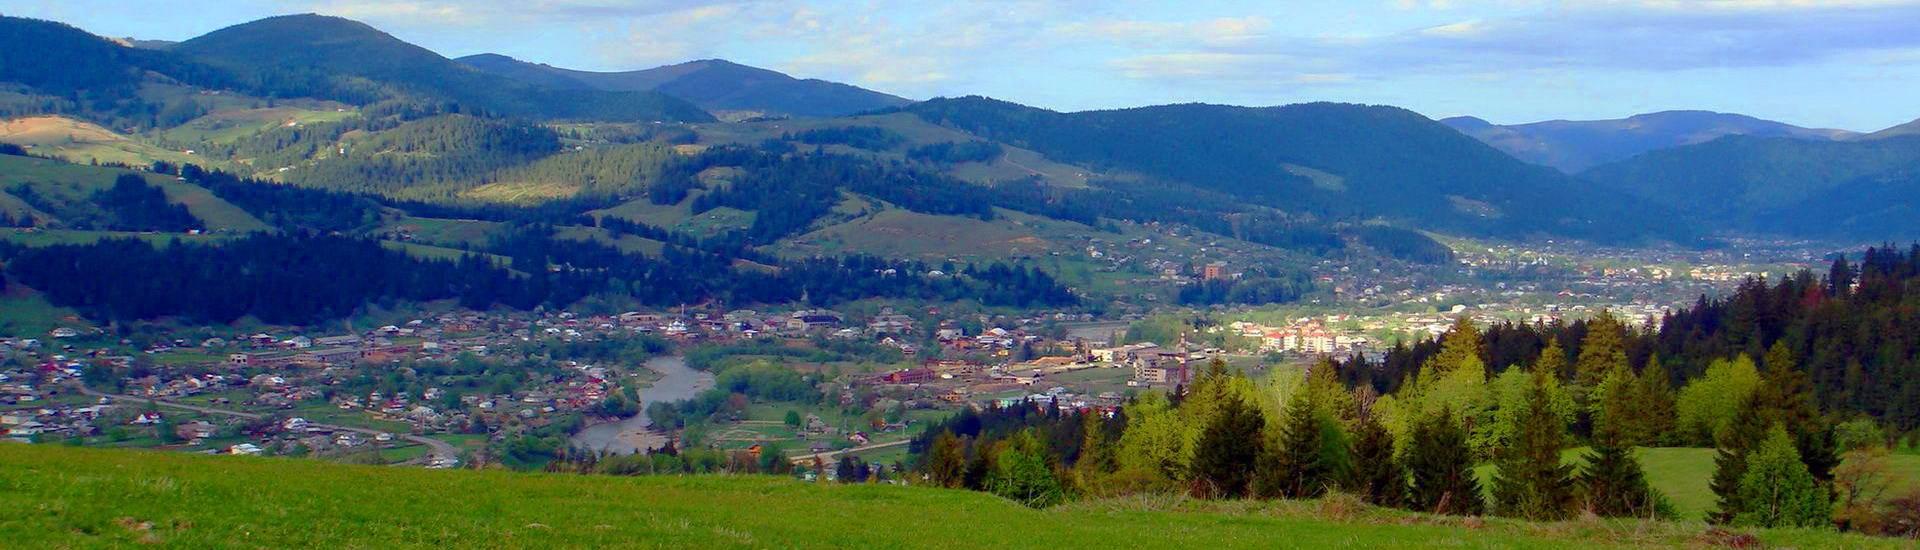 Карпатське гірське село Красник